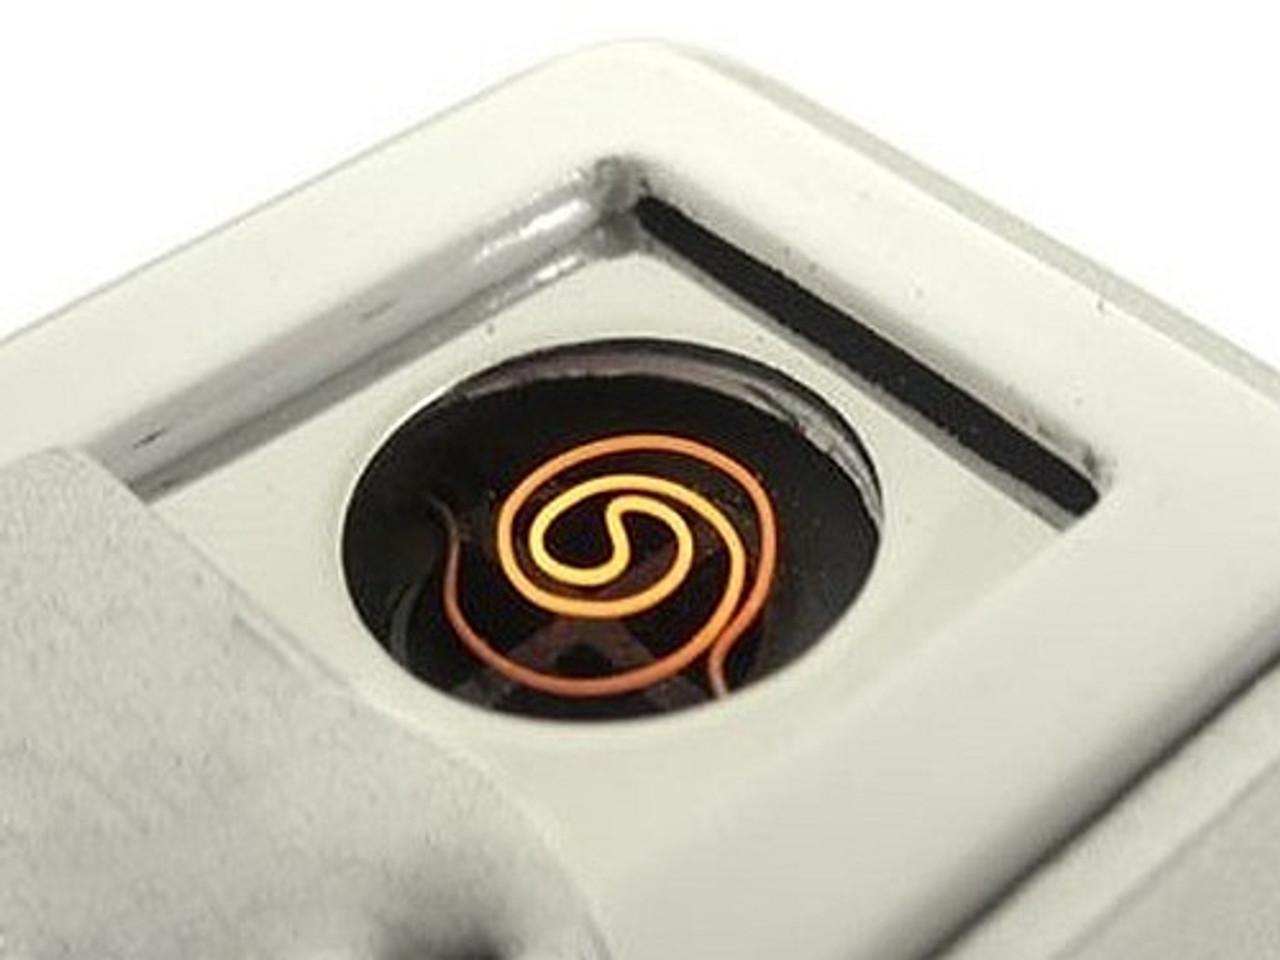 Zen USB Electronic Rechargeable Lighter